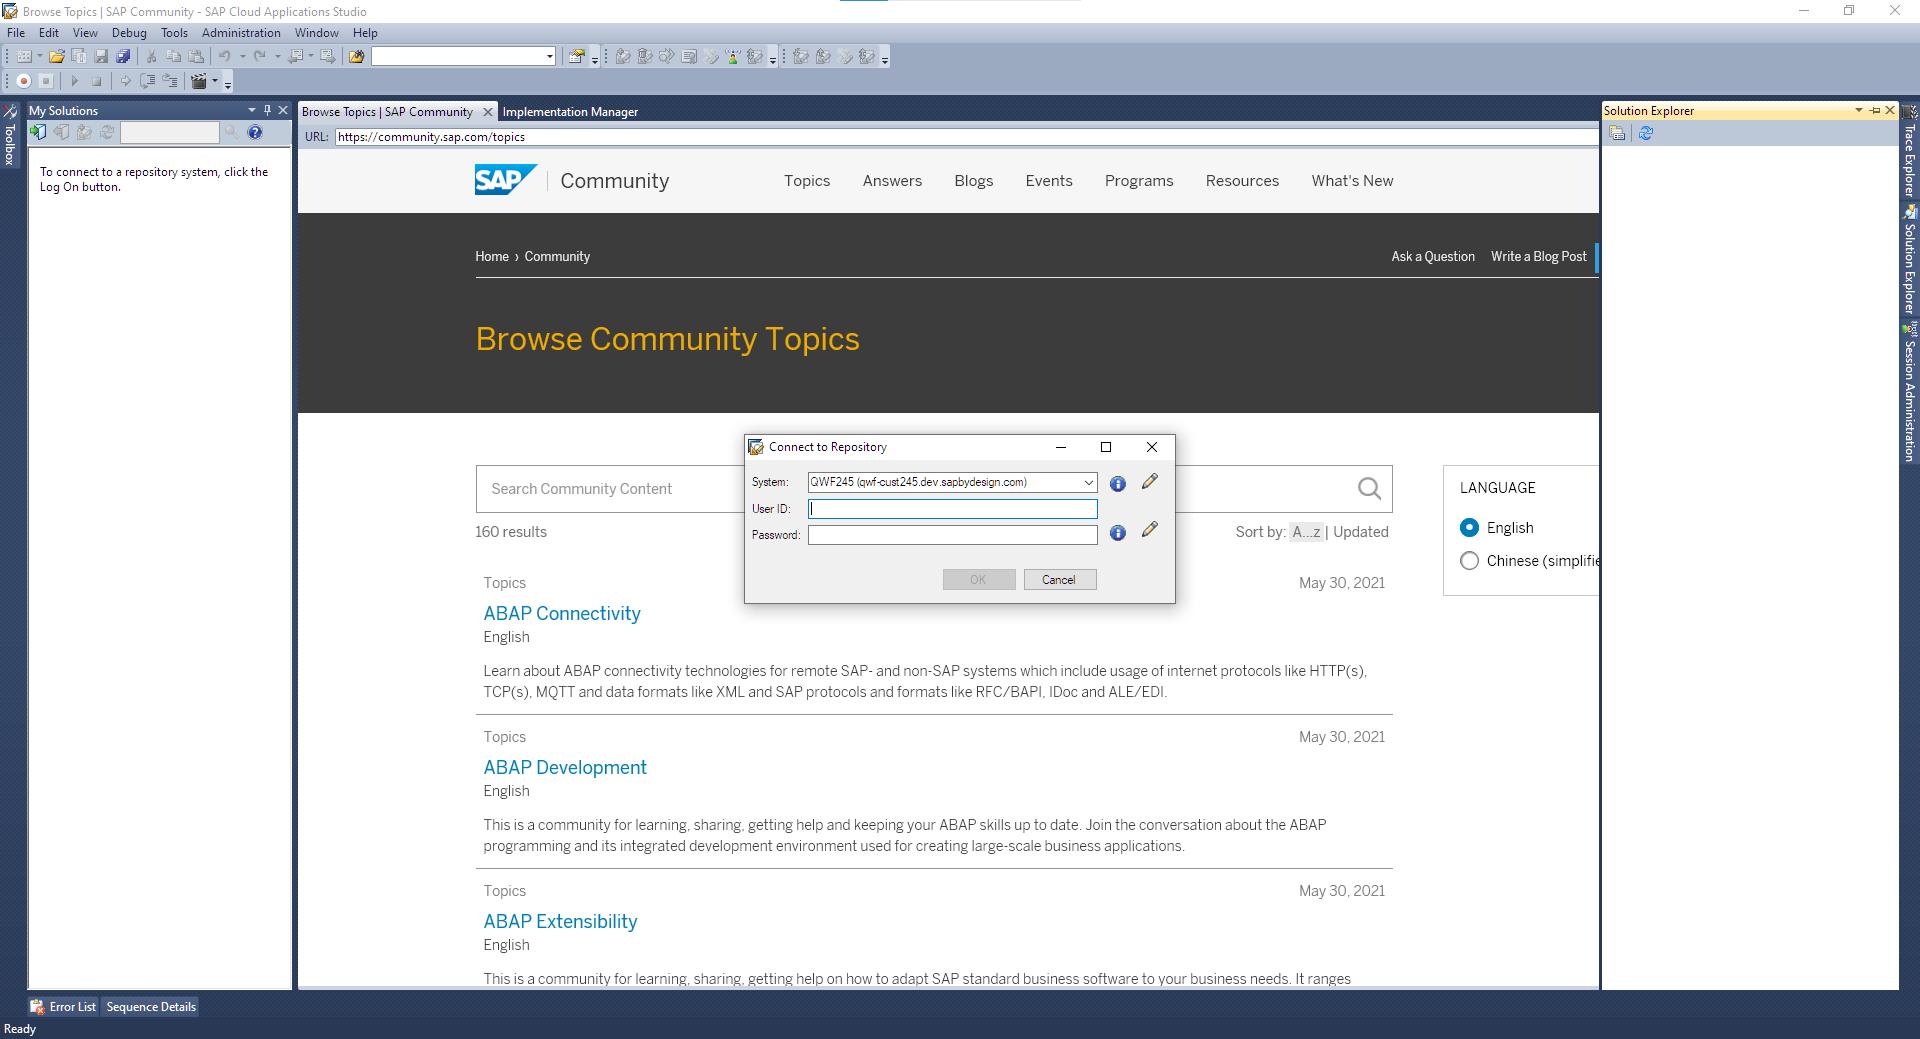 SAP%20Cloud%20Application%20Studio%20Login%20Screen